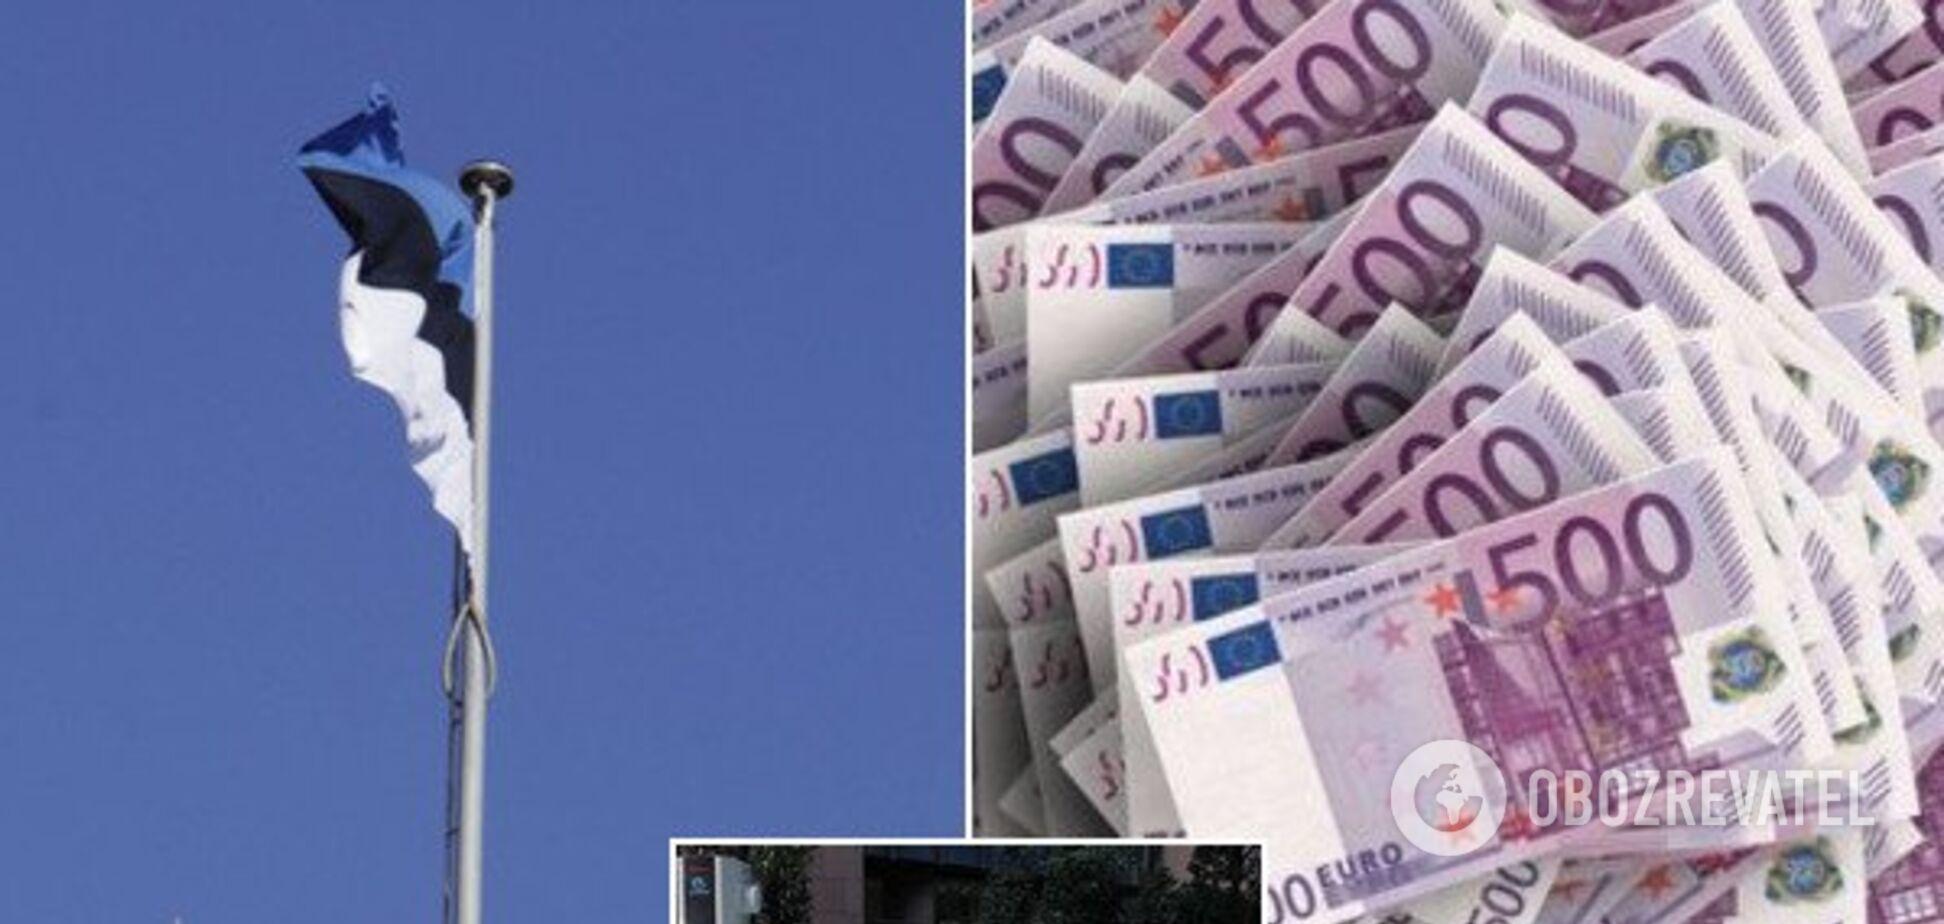 Эстония раздаст на руки жителям по 5 тысяч евро: в чем причина